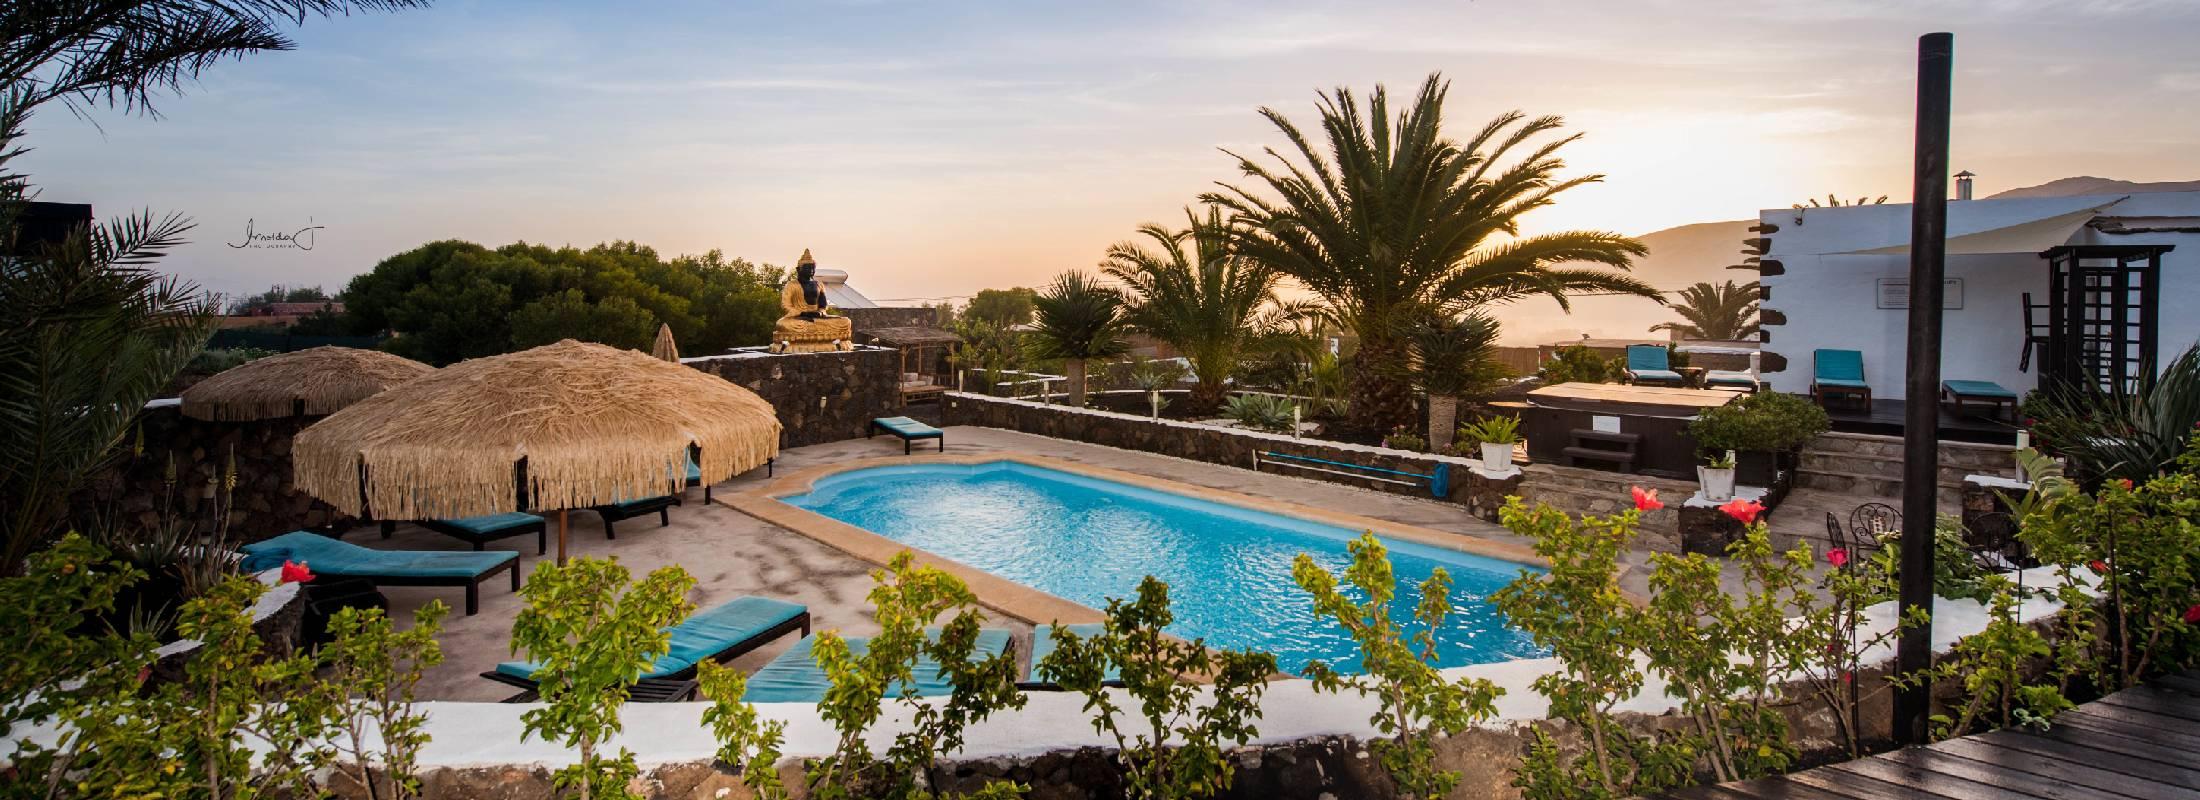 piscina del retiro en Fuerteventura de yoga y pilates